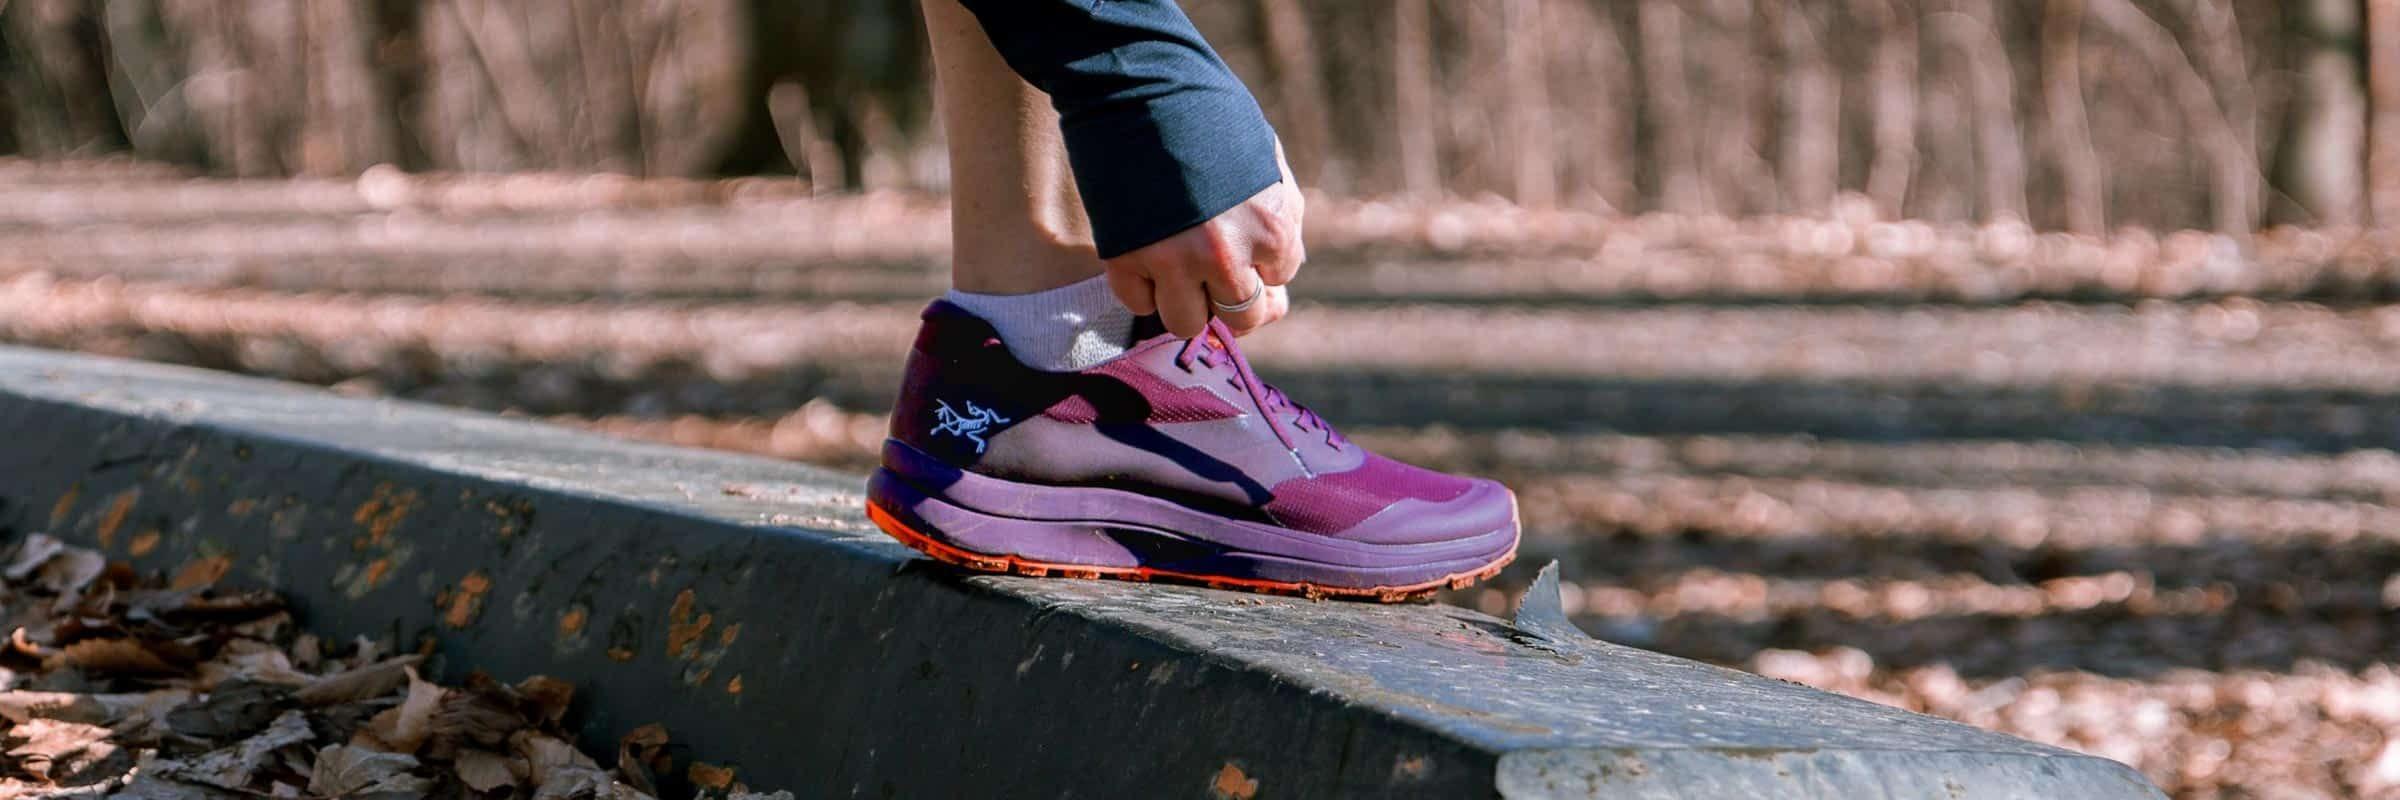 Arc'teryx Women's Norvan LD Trail Shoe Reviewed